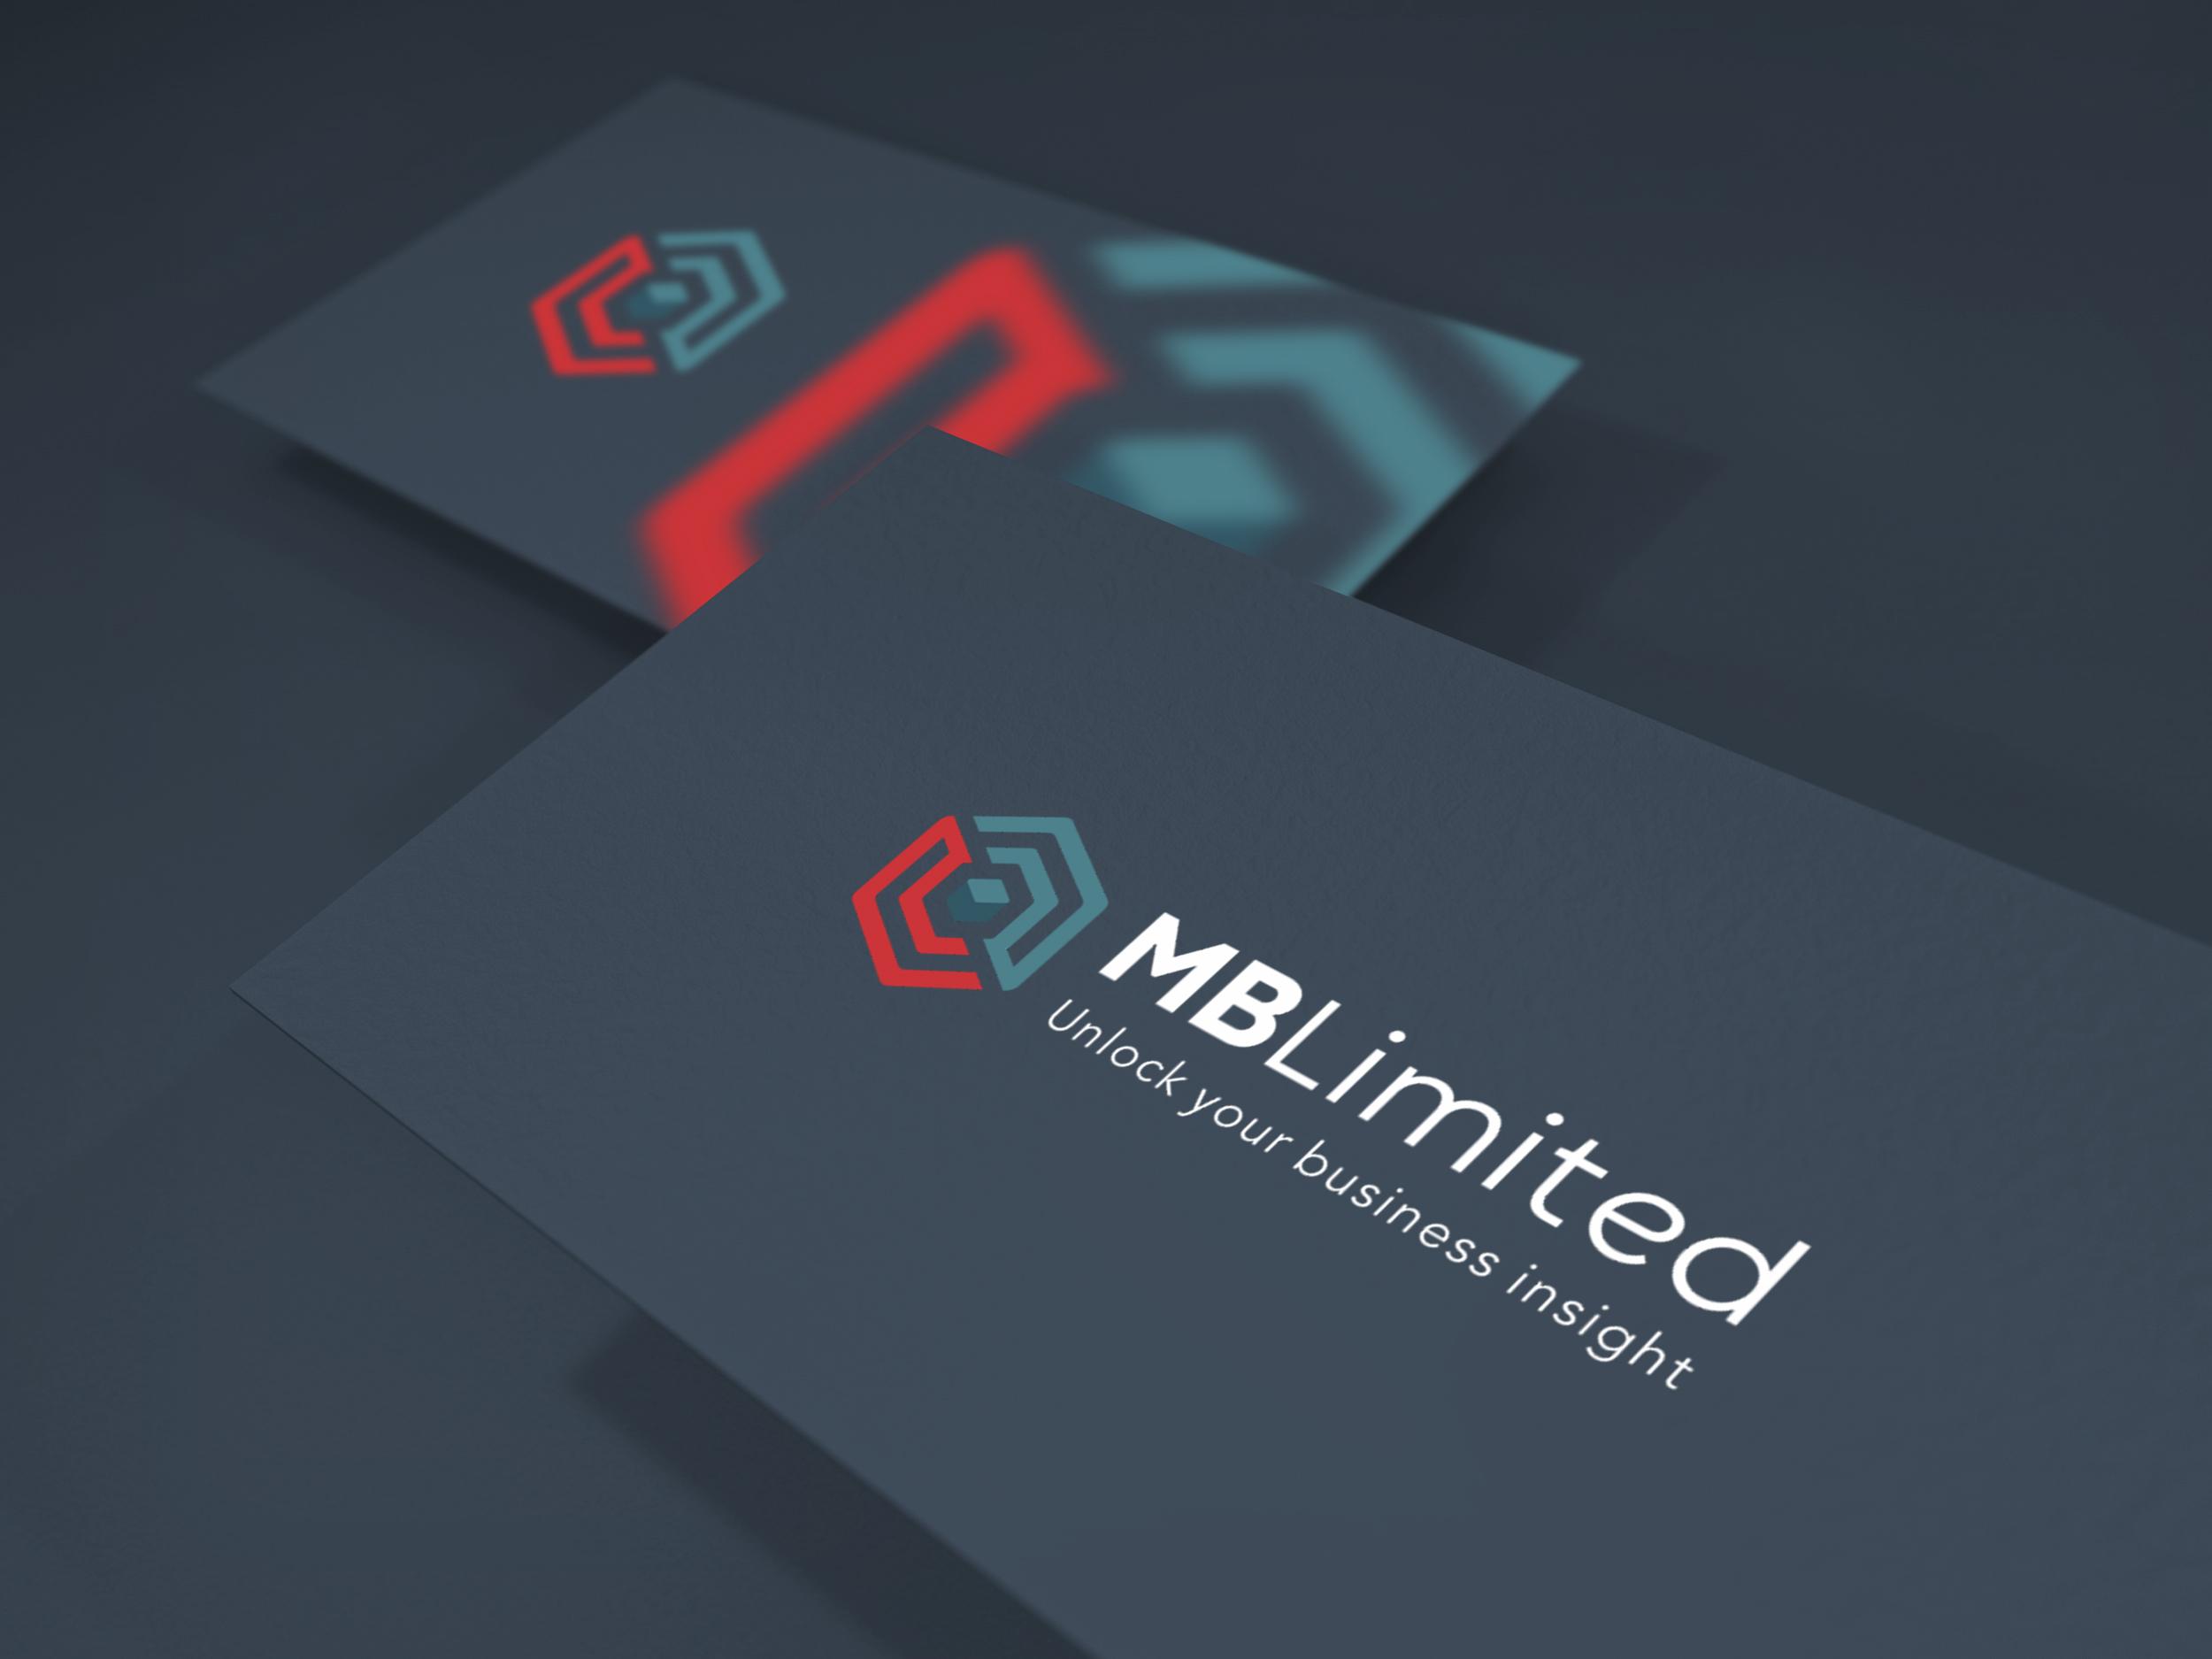 moo_design_mb_limited7